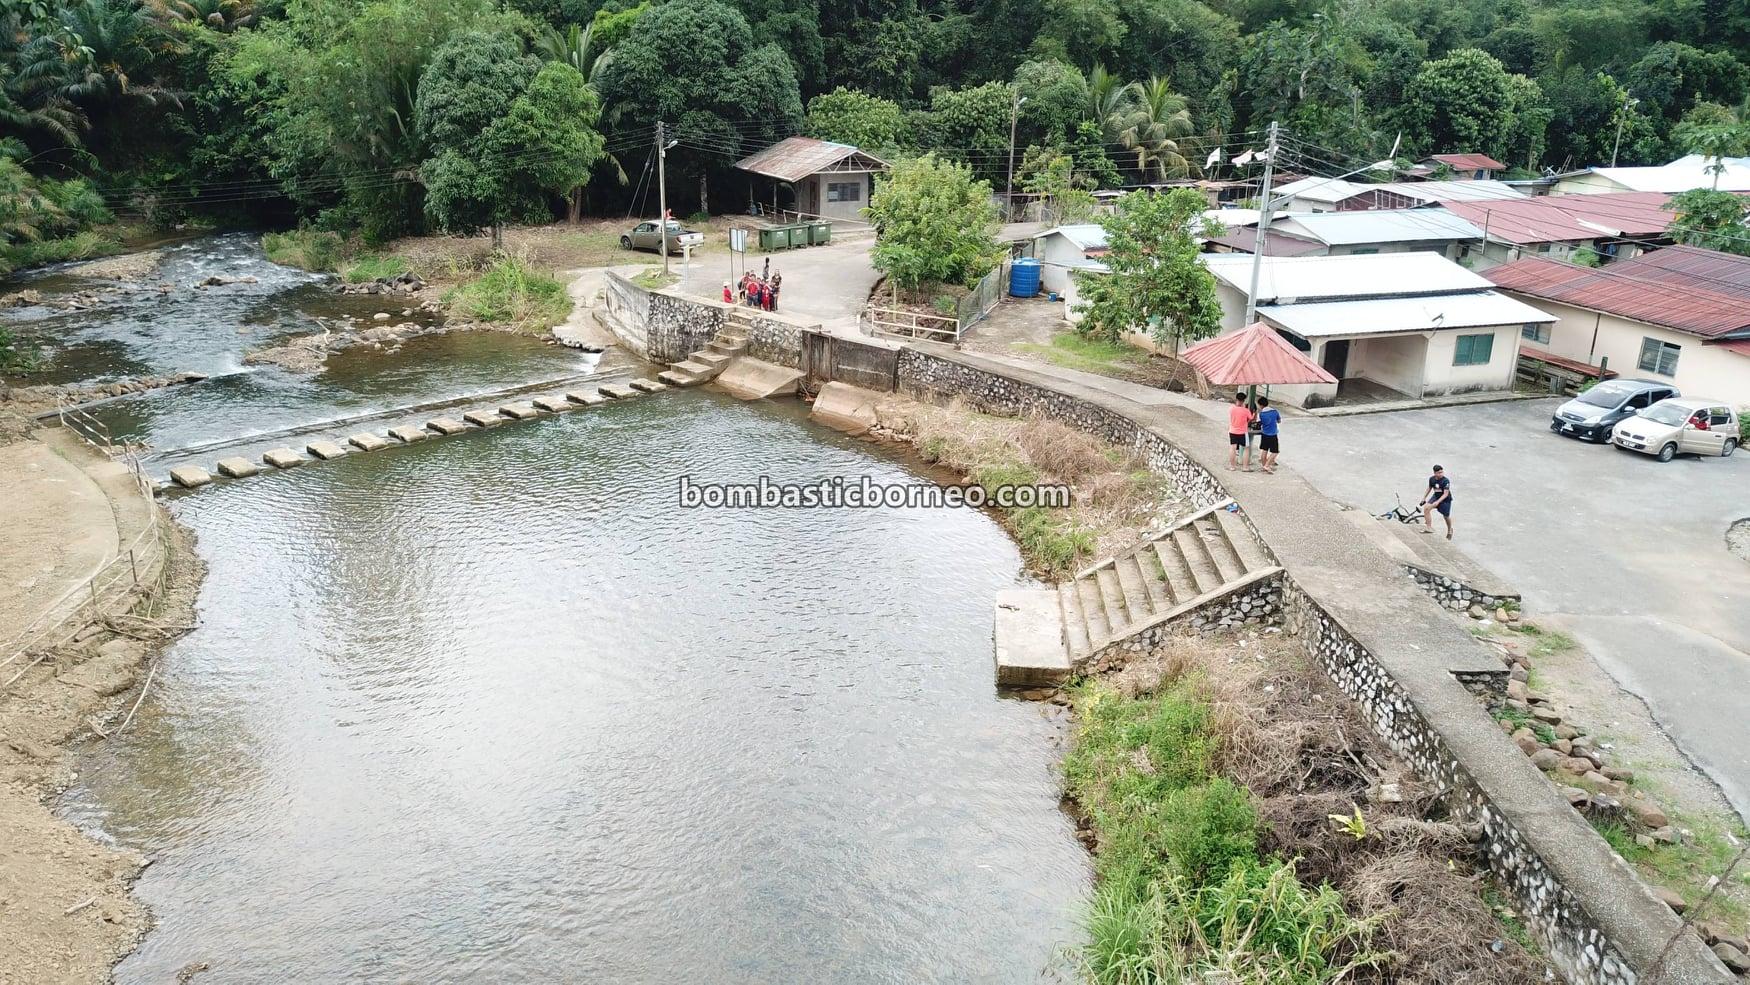 Kampung Bunan Gega, native, paddy field, exploration, Malaysia, Tourism, travel guide, travel local, Trans Borneo, 探索婆罗洲游踪, 马来西亚砂拉越, 西连比达友村庄